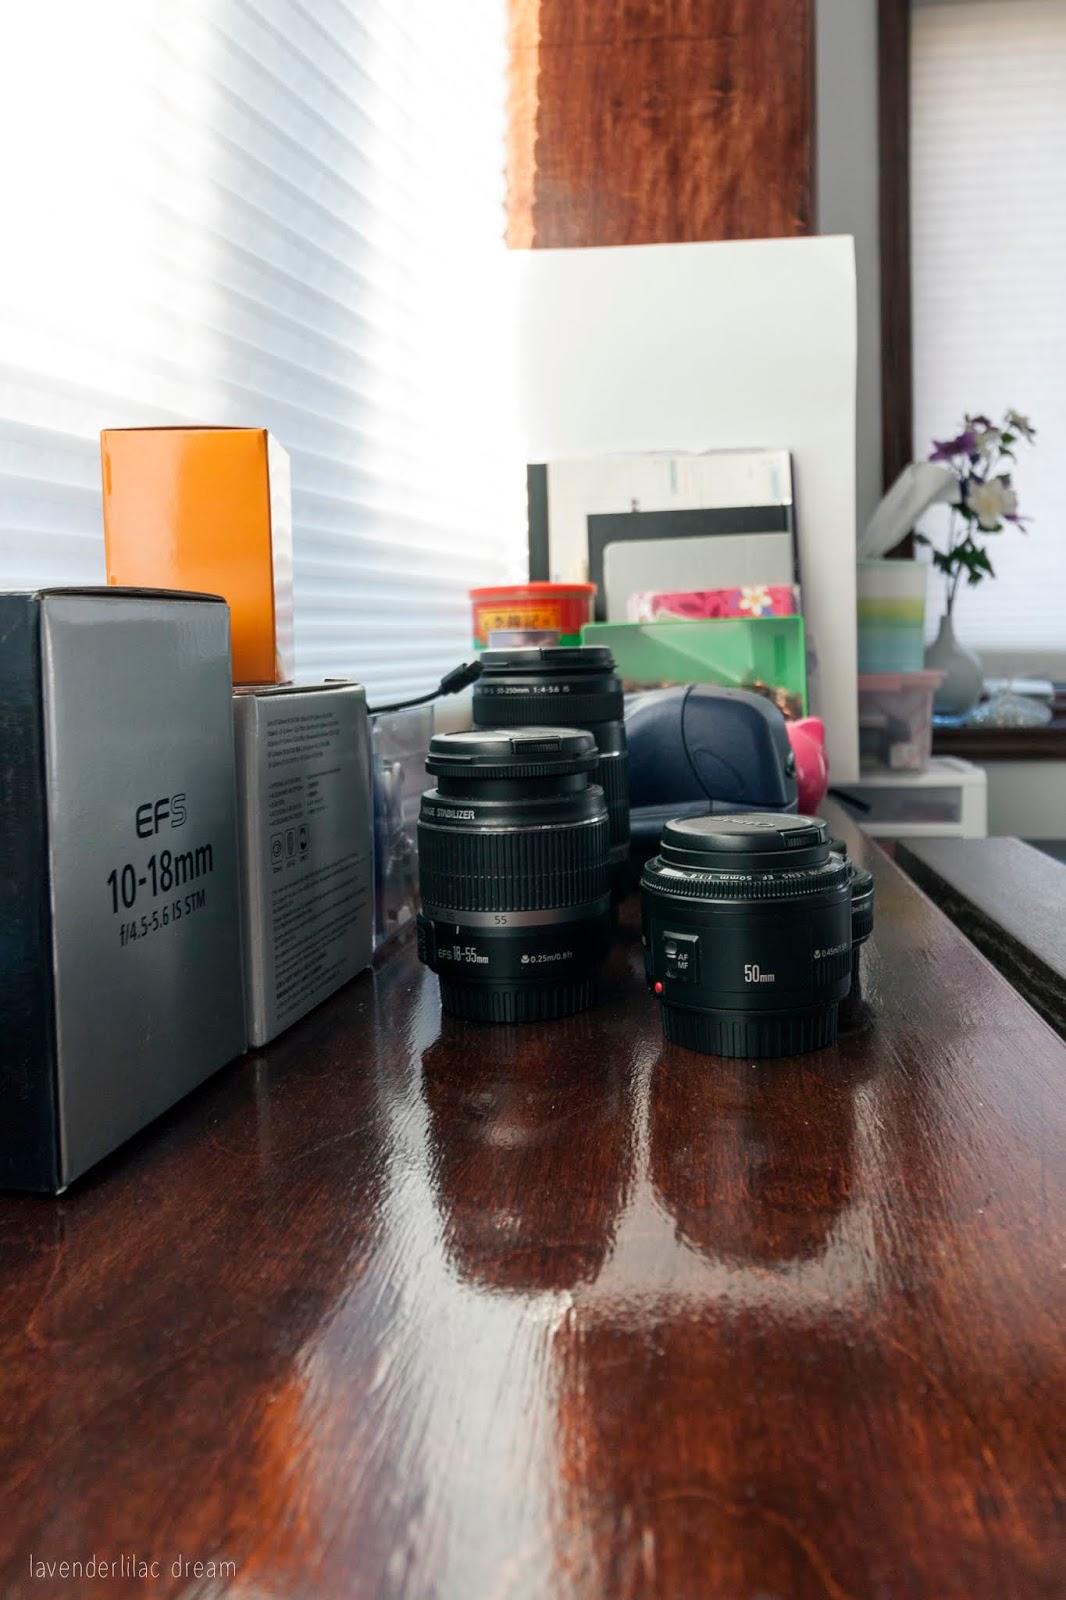 Camera lenses & notebook display